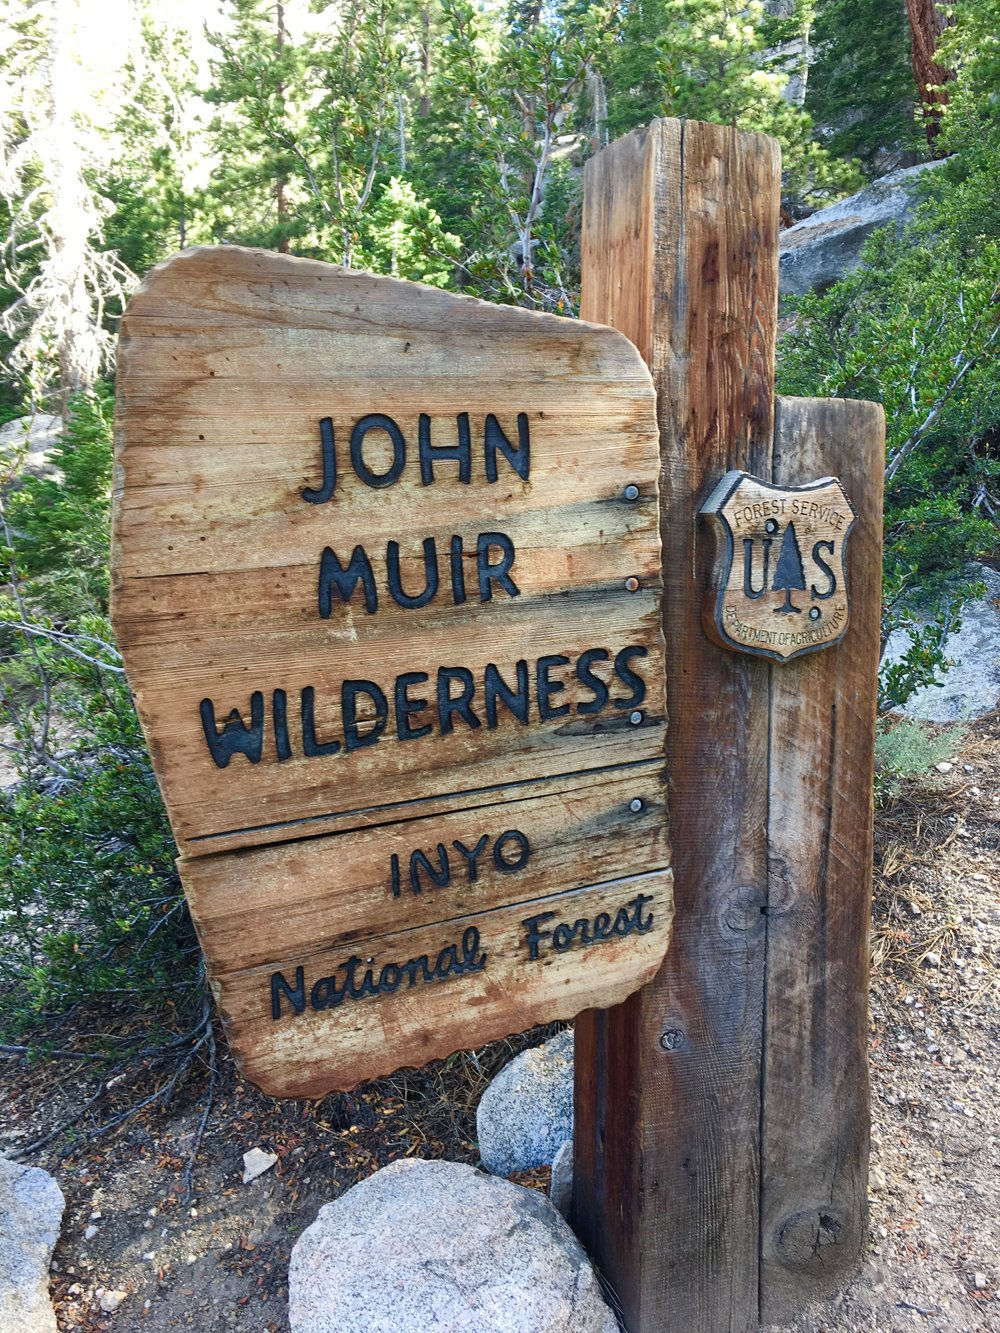 John Muir Wilderness sign on the trail